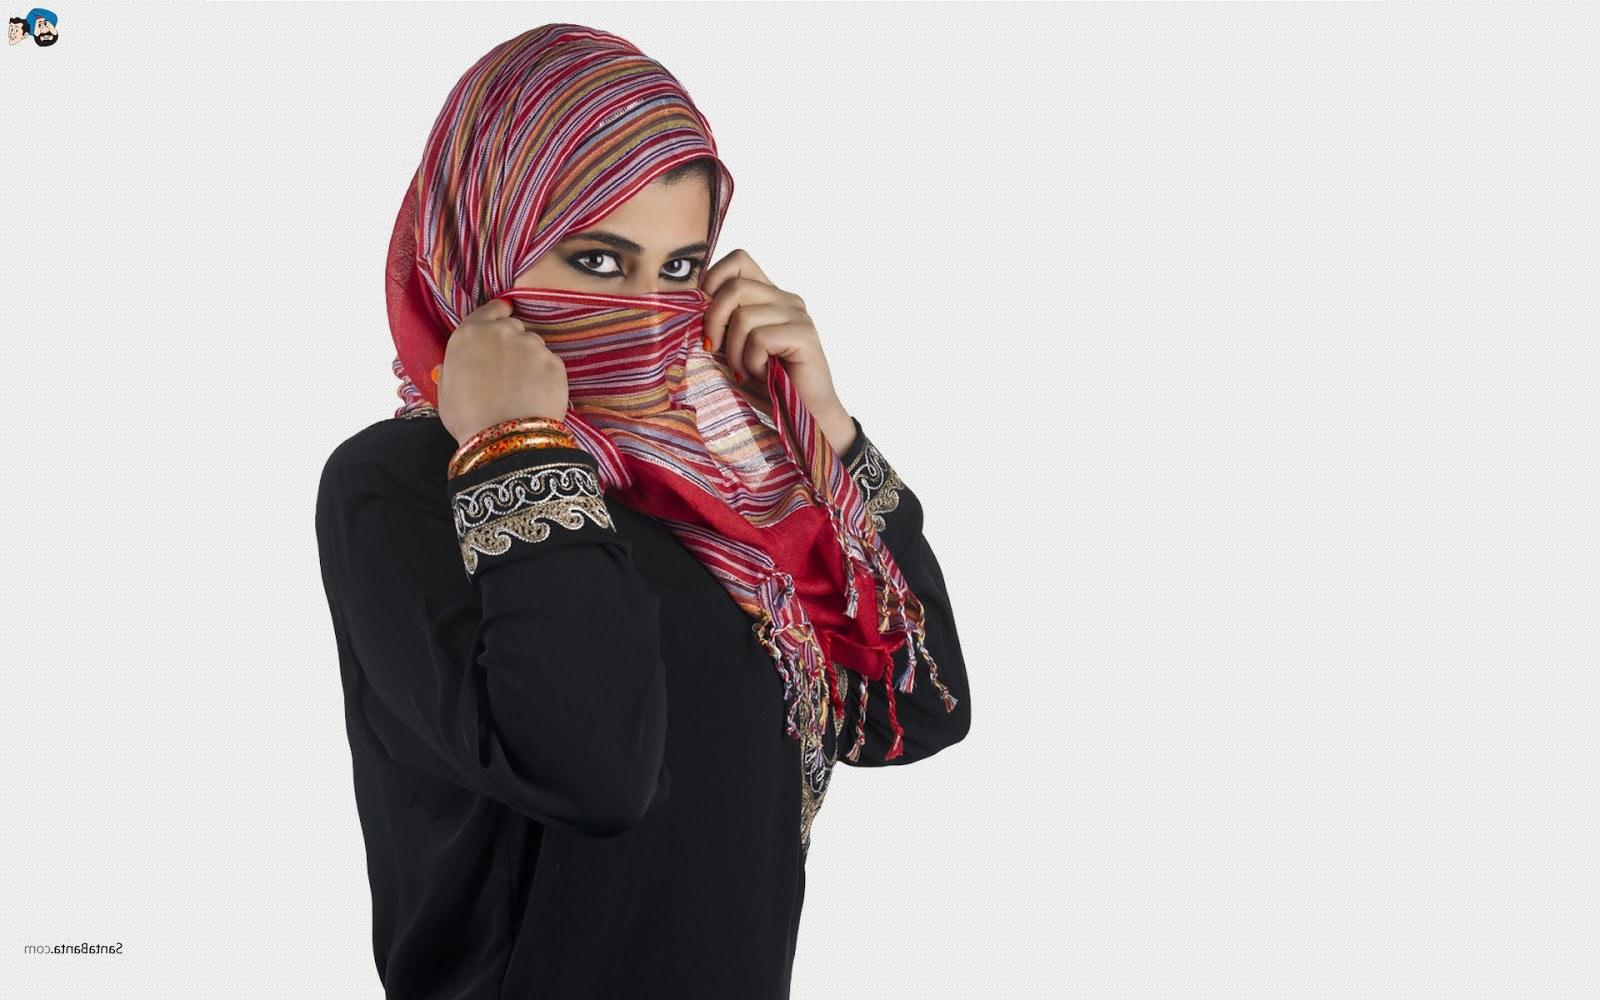 Ide Muslimah Bercadar O2d5 Koleksi Wallpaper Wanita Muslimah Bercadar